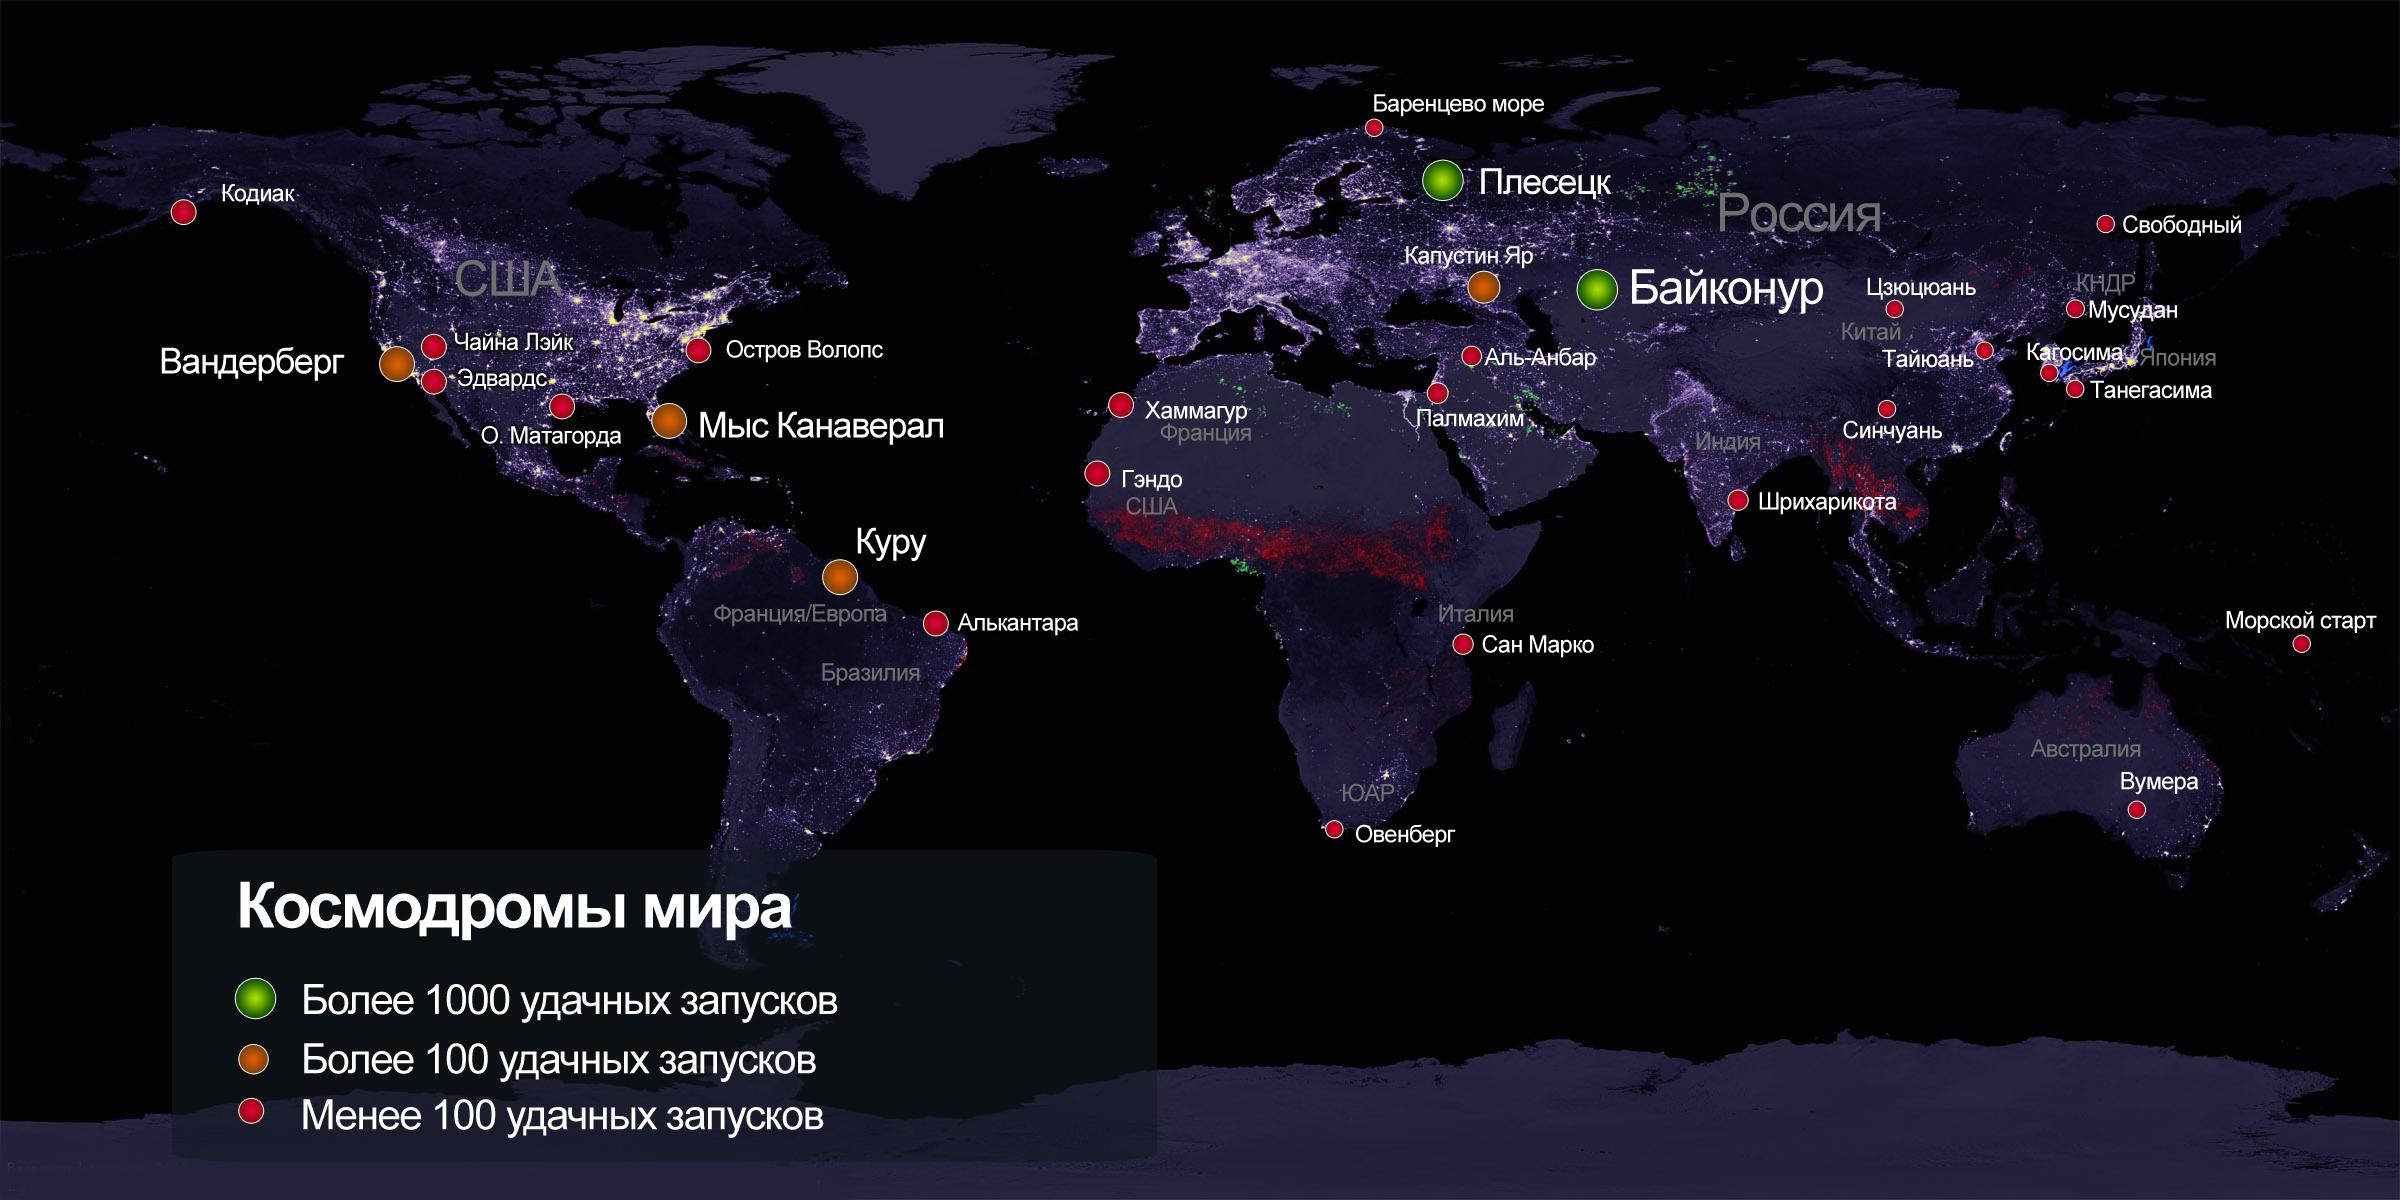 cosmodrom-map